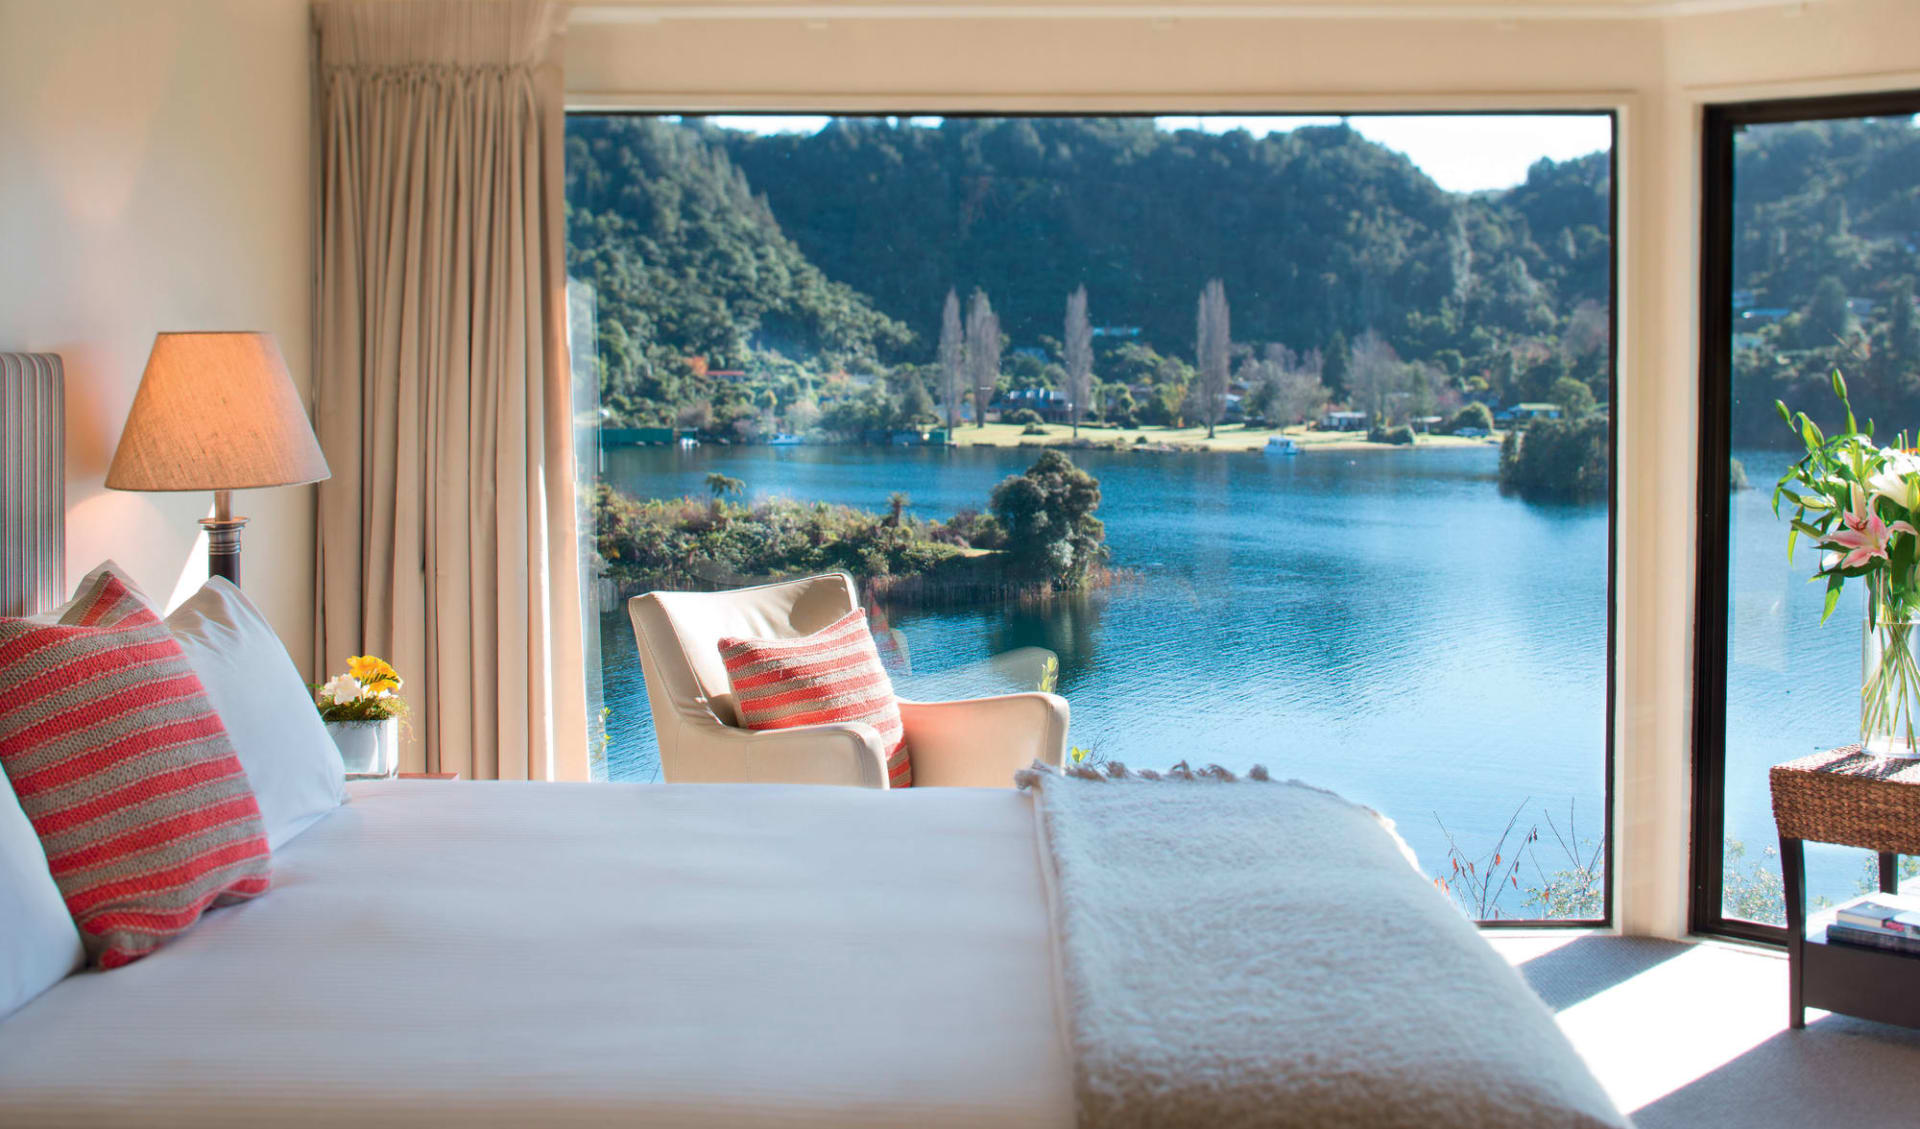 Solitaire Lodge in Rotorua:  Solitaire Lodge - Executive Suite